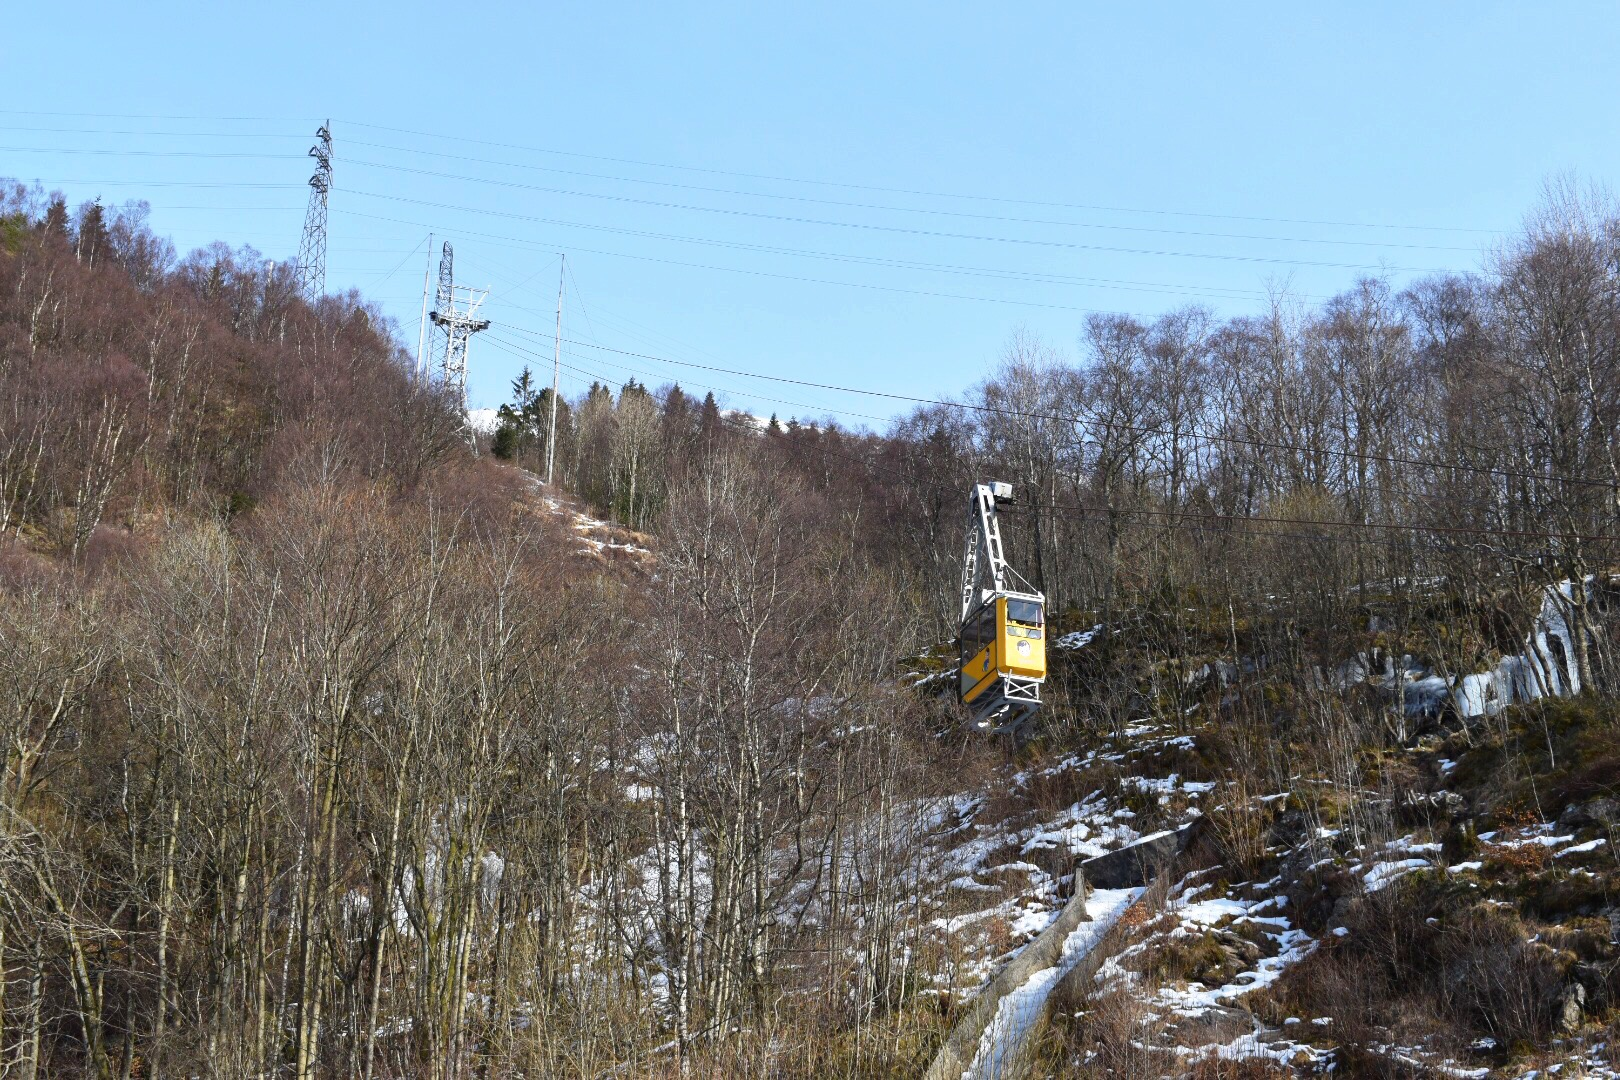 The Yellow Cable Car to Mount Unlriken in Bergen, Norway